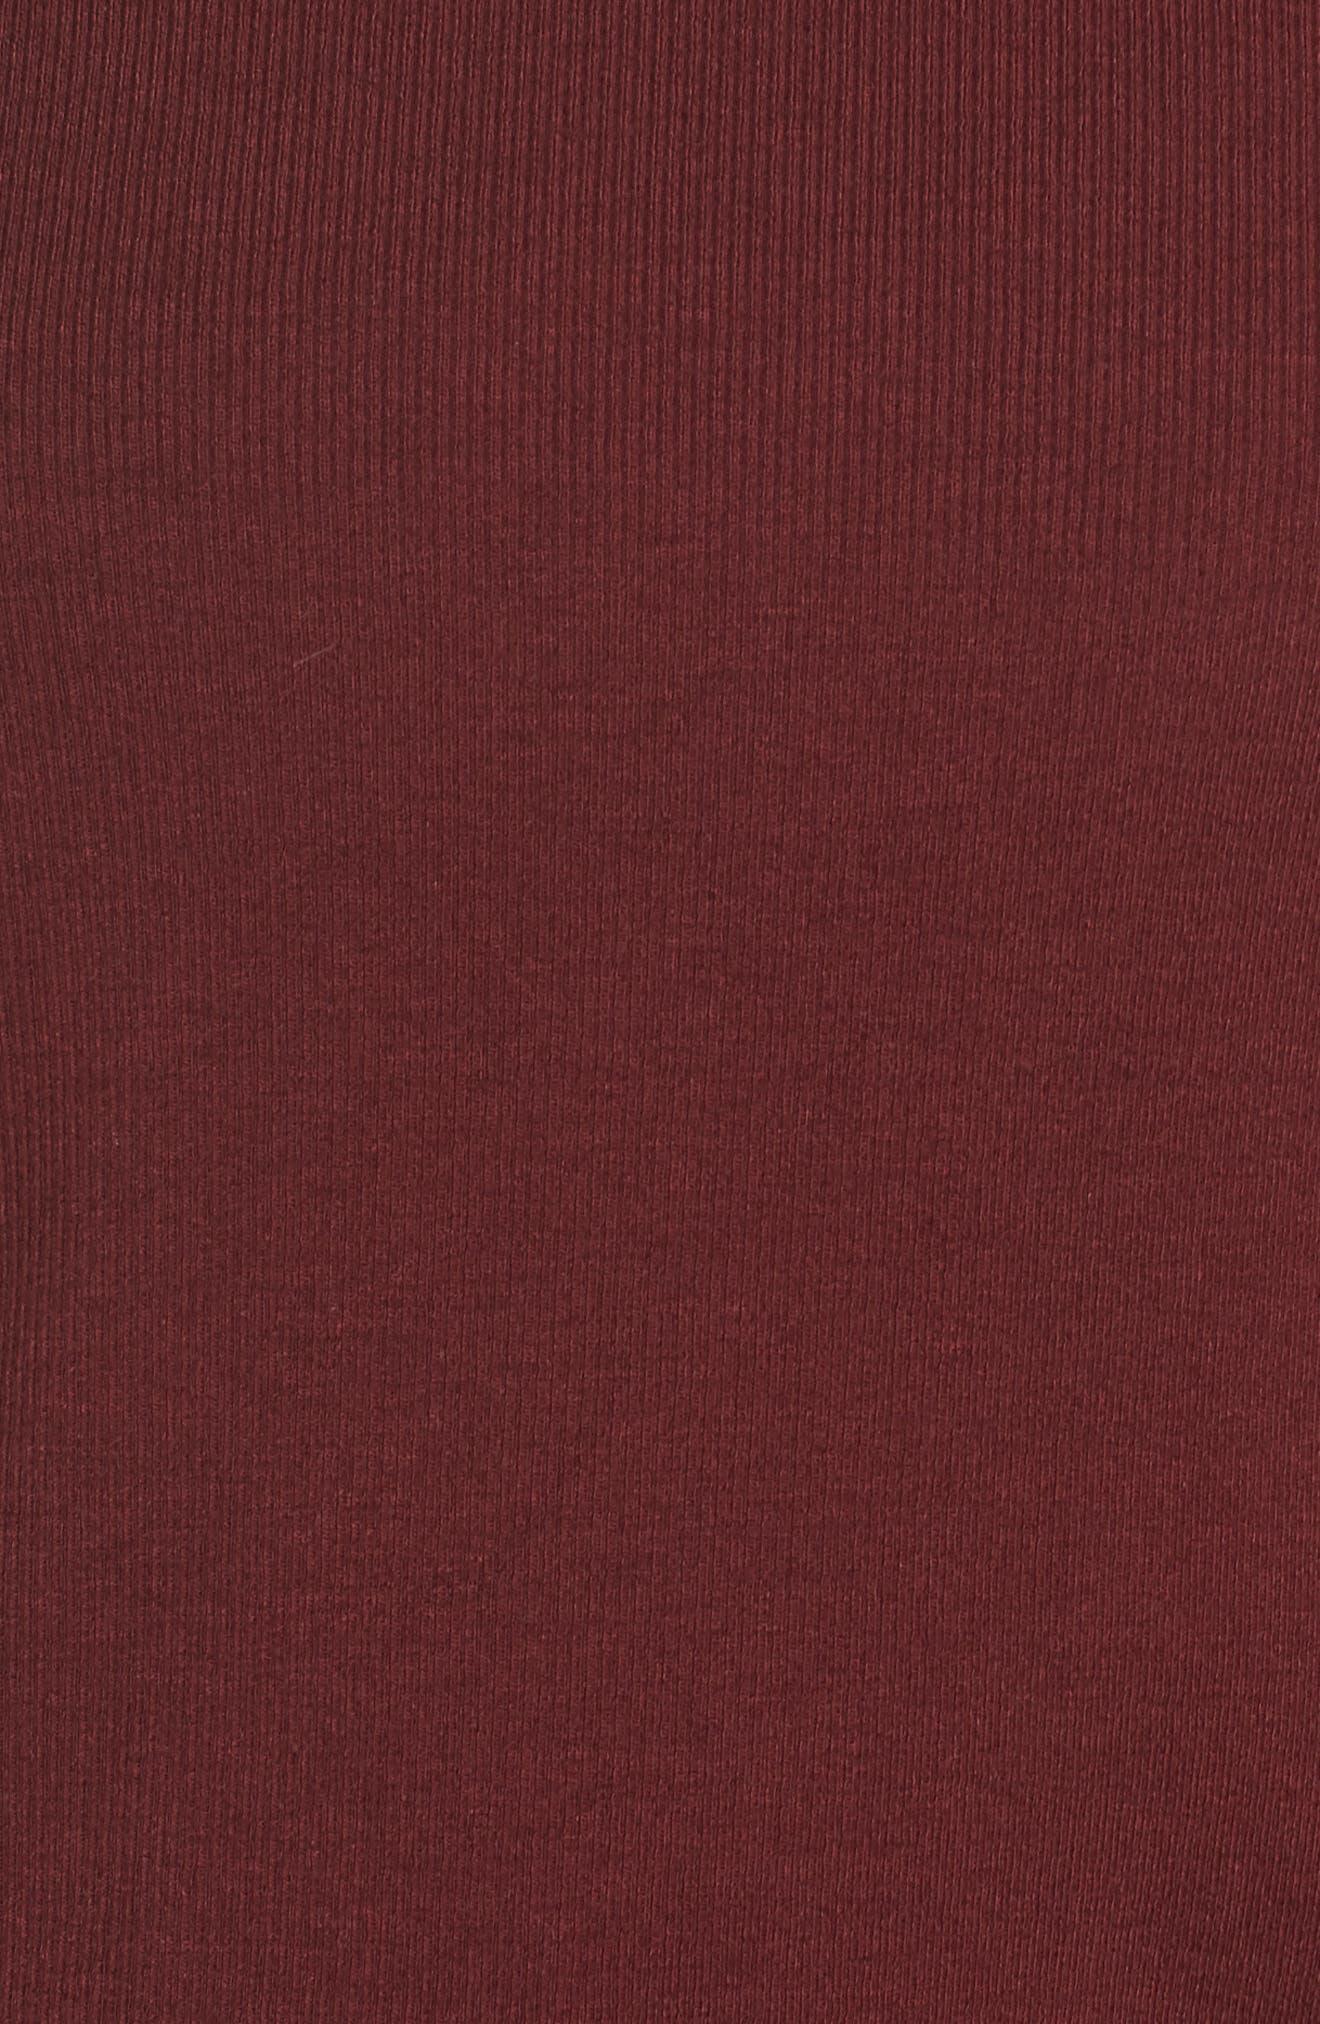 Defender Long-Sleeve Tee,                             Alternate thumbnail 6, color,                             MAROON/ MAPLE